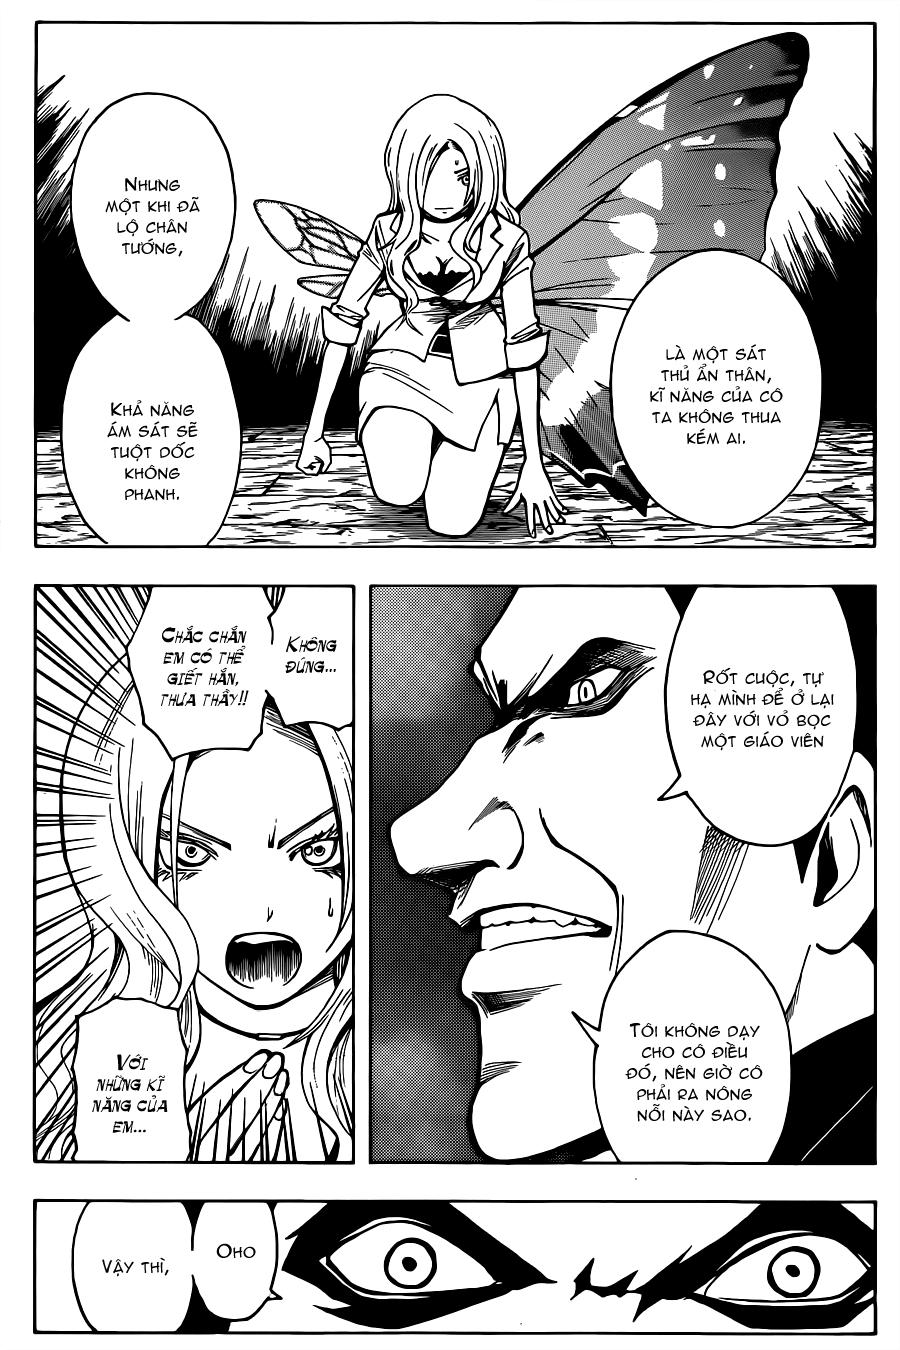 Ansatsu Kyoushitsu chap 25 trang 16